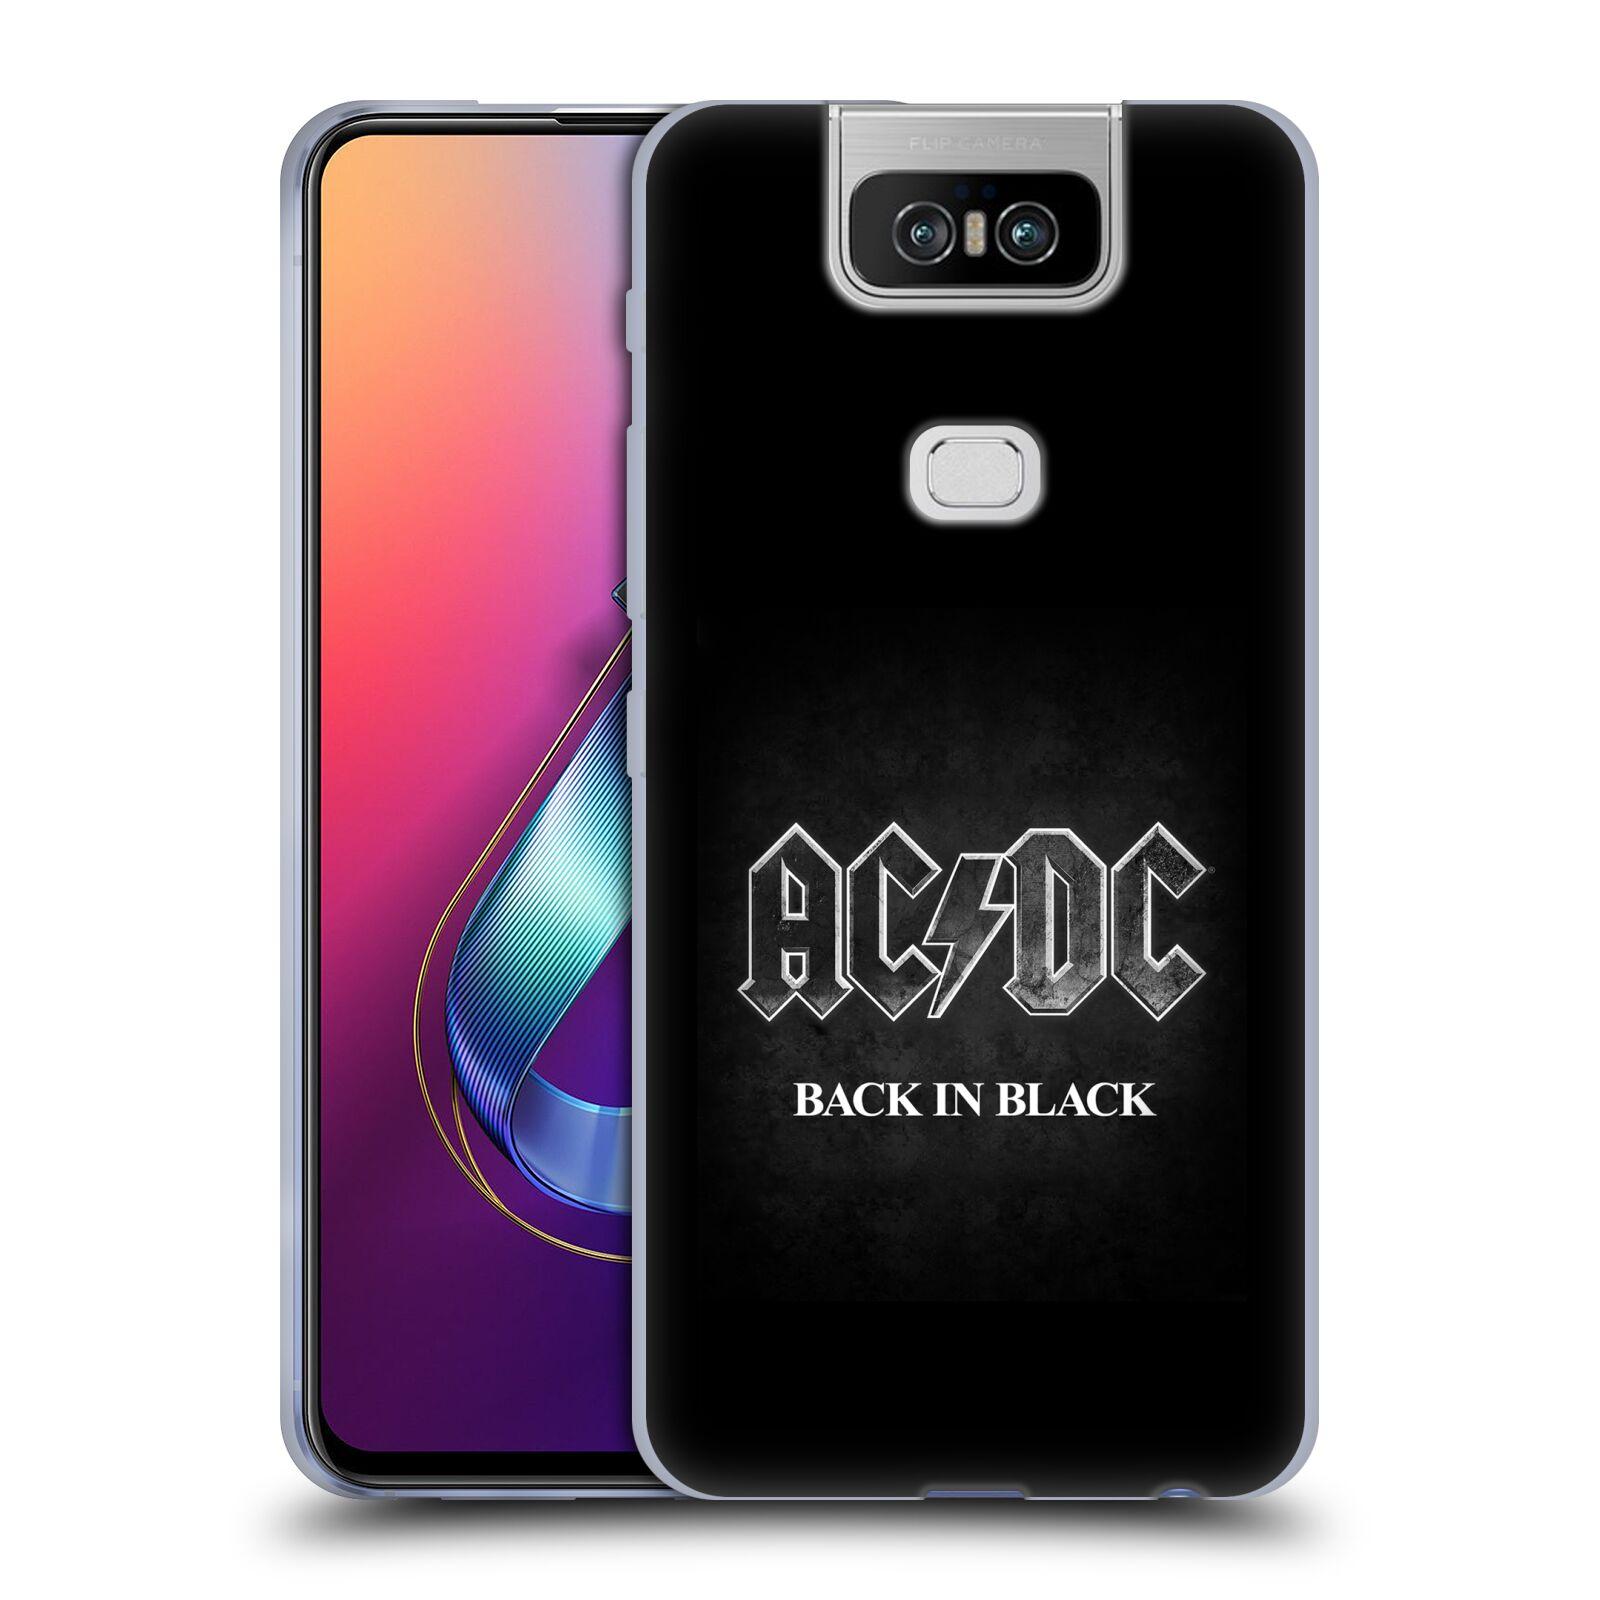 Silikonové pouzdro na mobil Asus Zenfone 6 ZS630KL - Head Case - AC/DC BACK IN BLACK